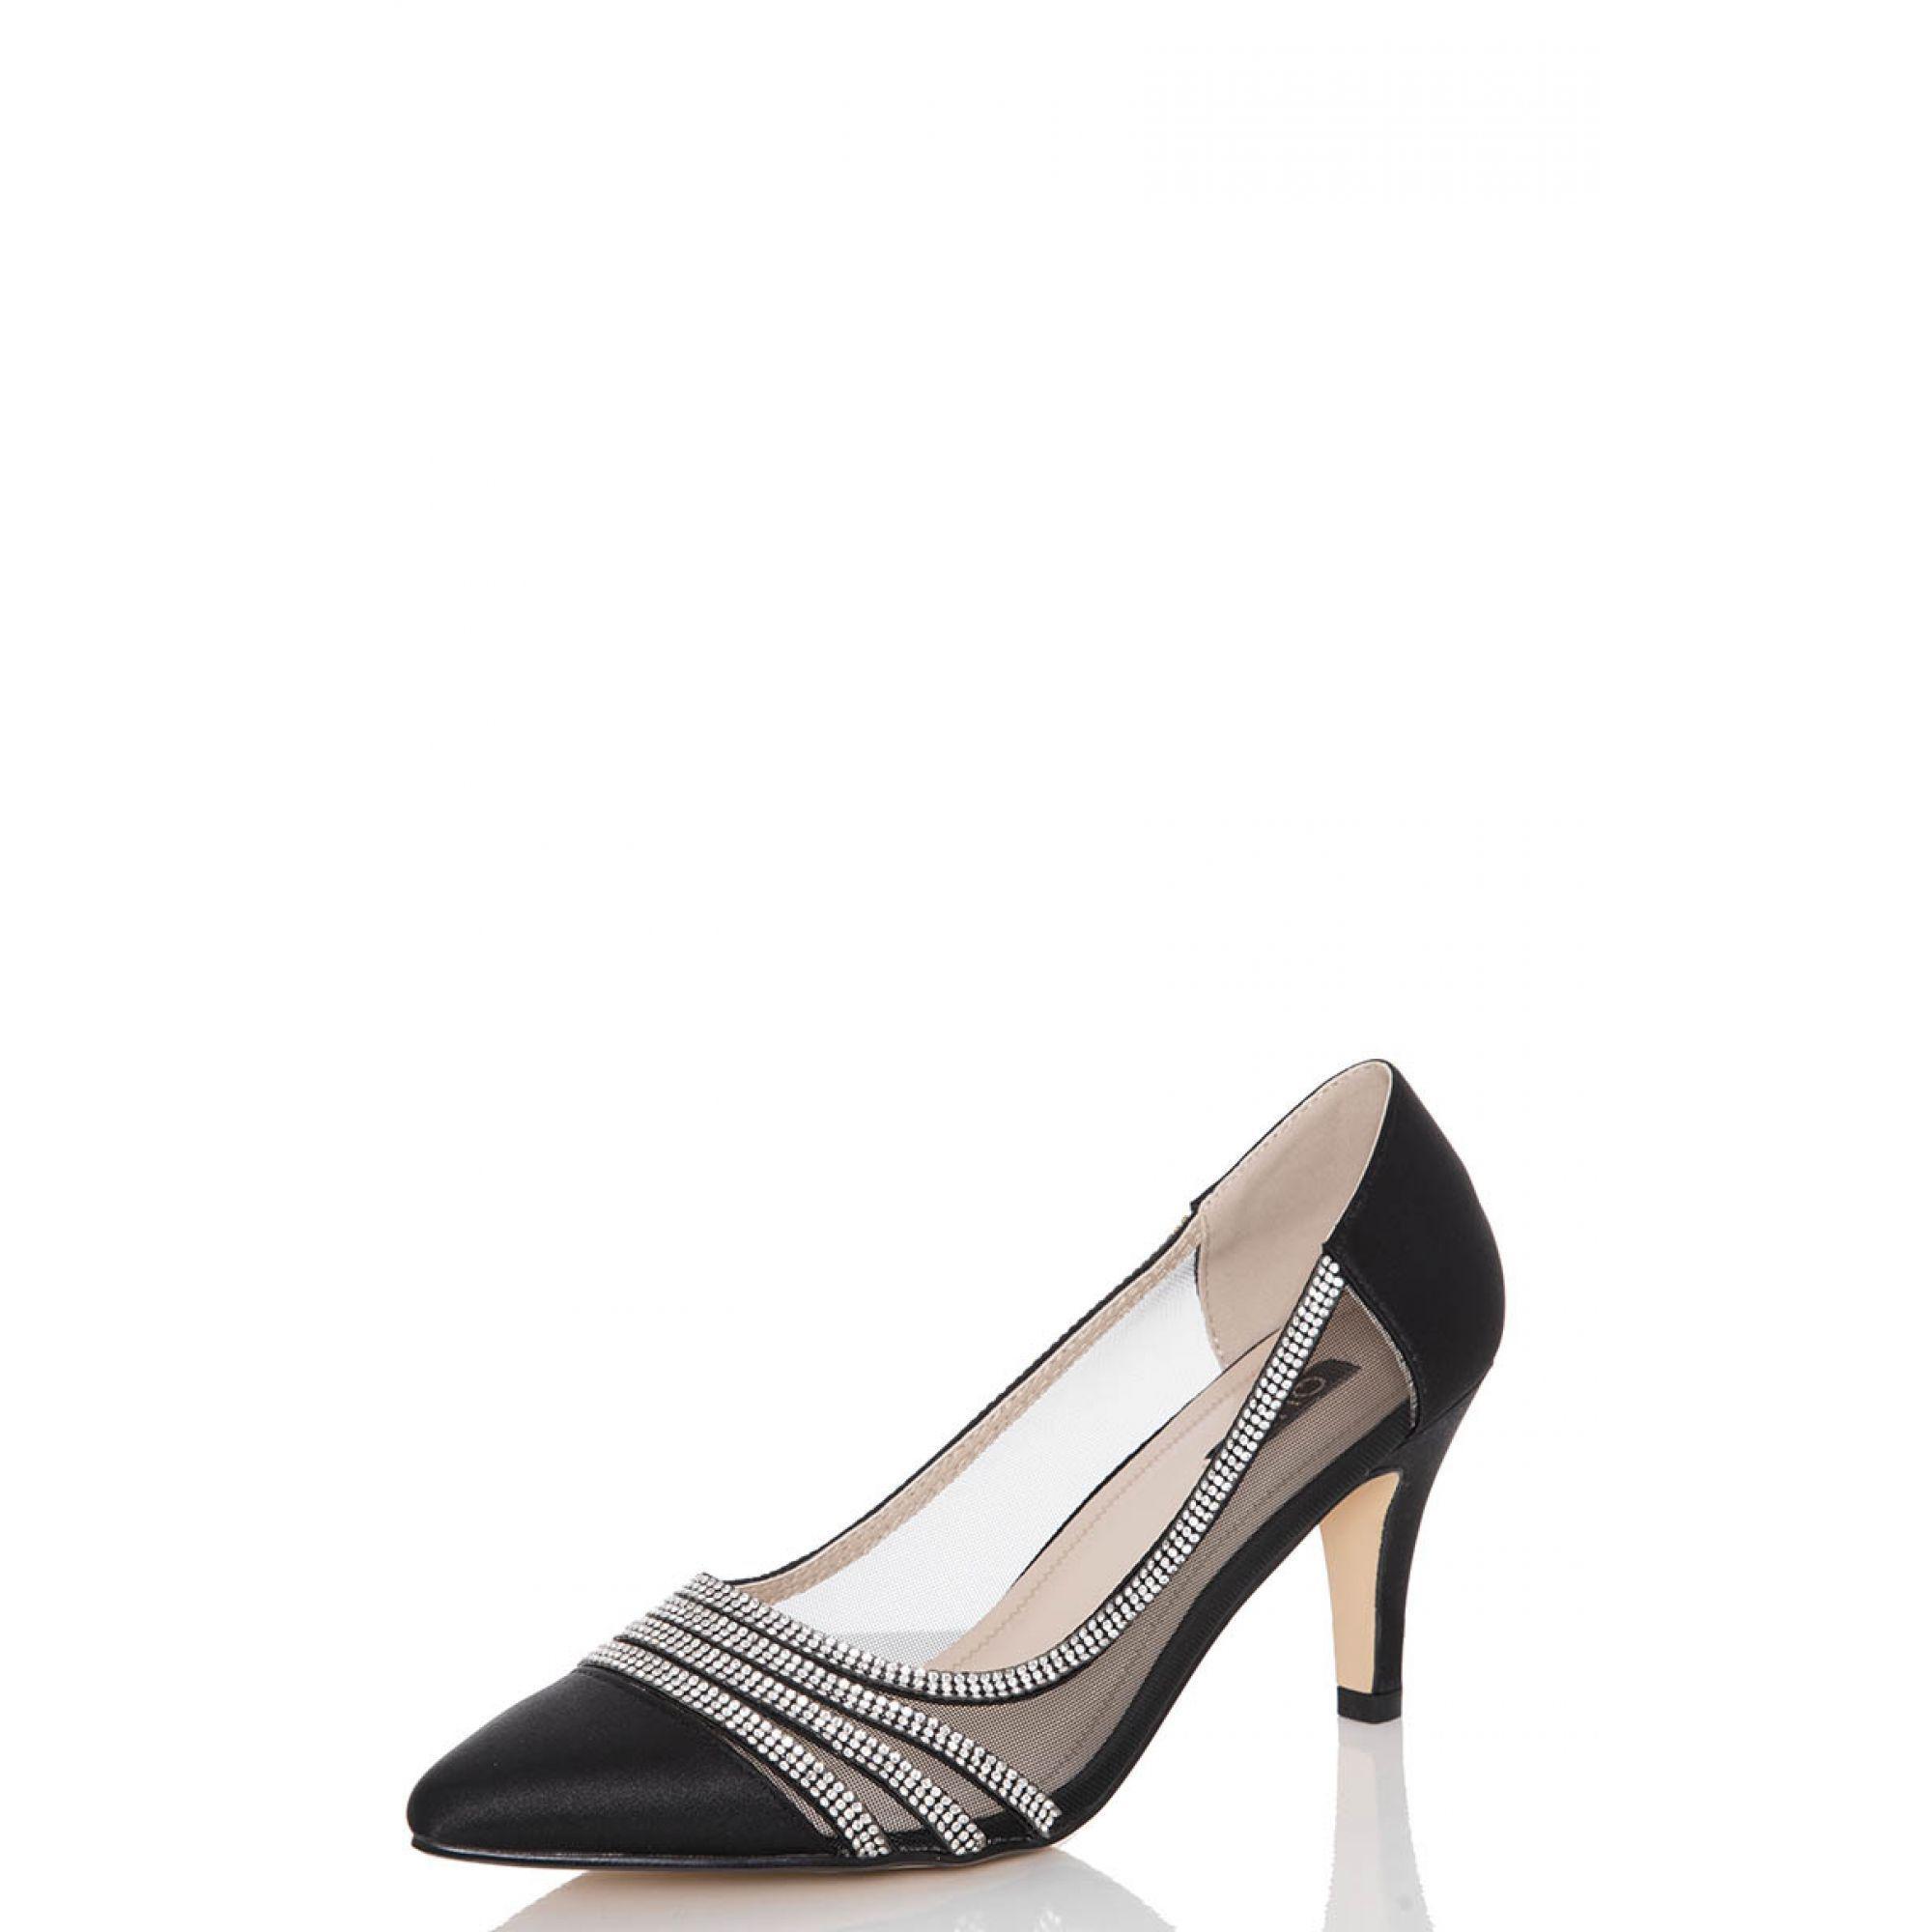 e6968734f9d Quiz - Black Satin Diamante Low Heel Court Shoes - Lyst. View fullscreen